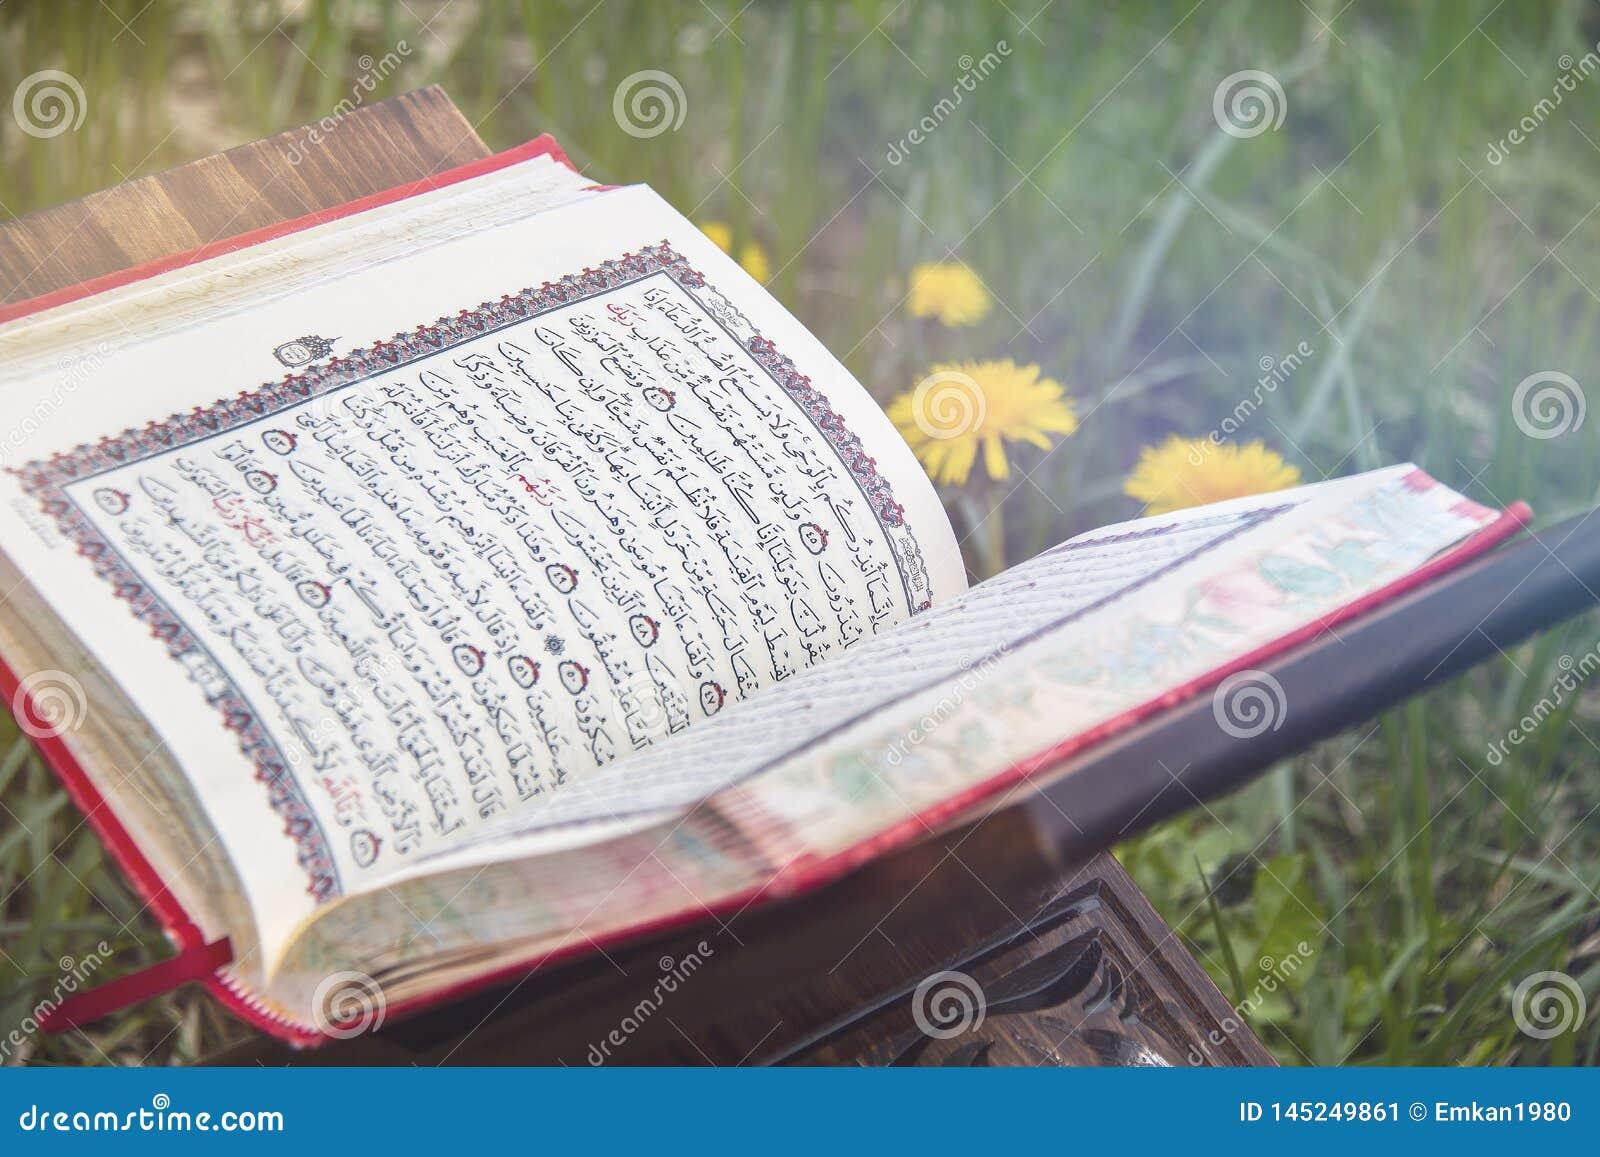 O Cor?o santamente - livro sagrado isl?mico